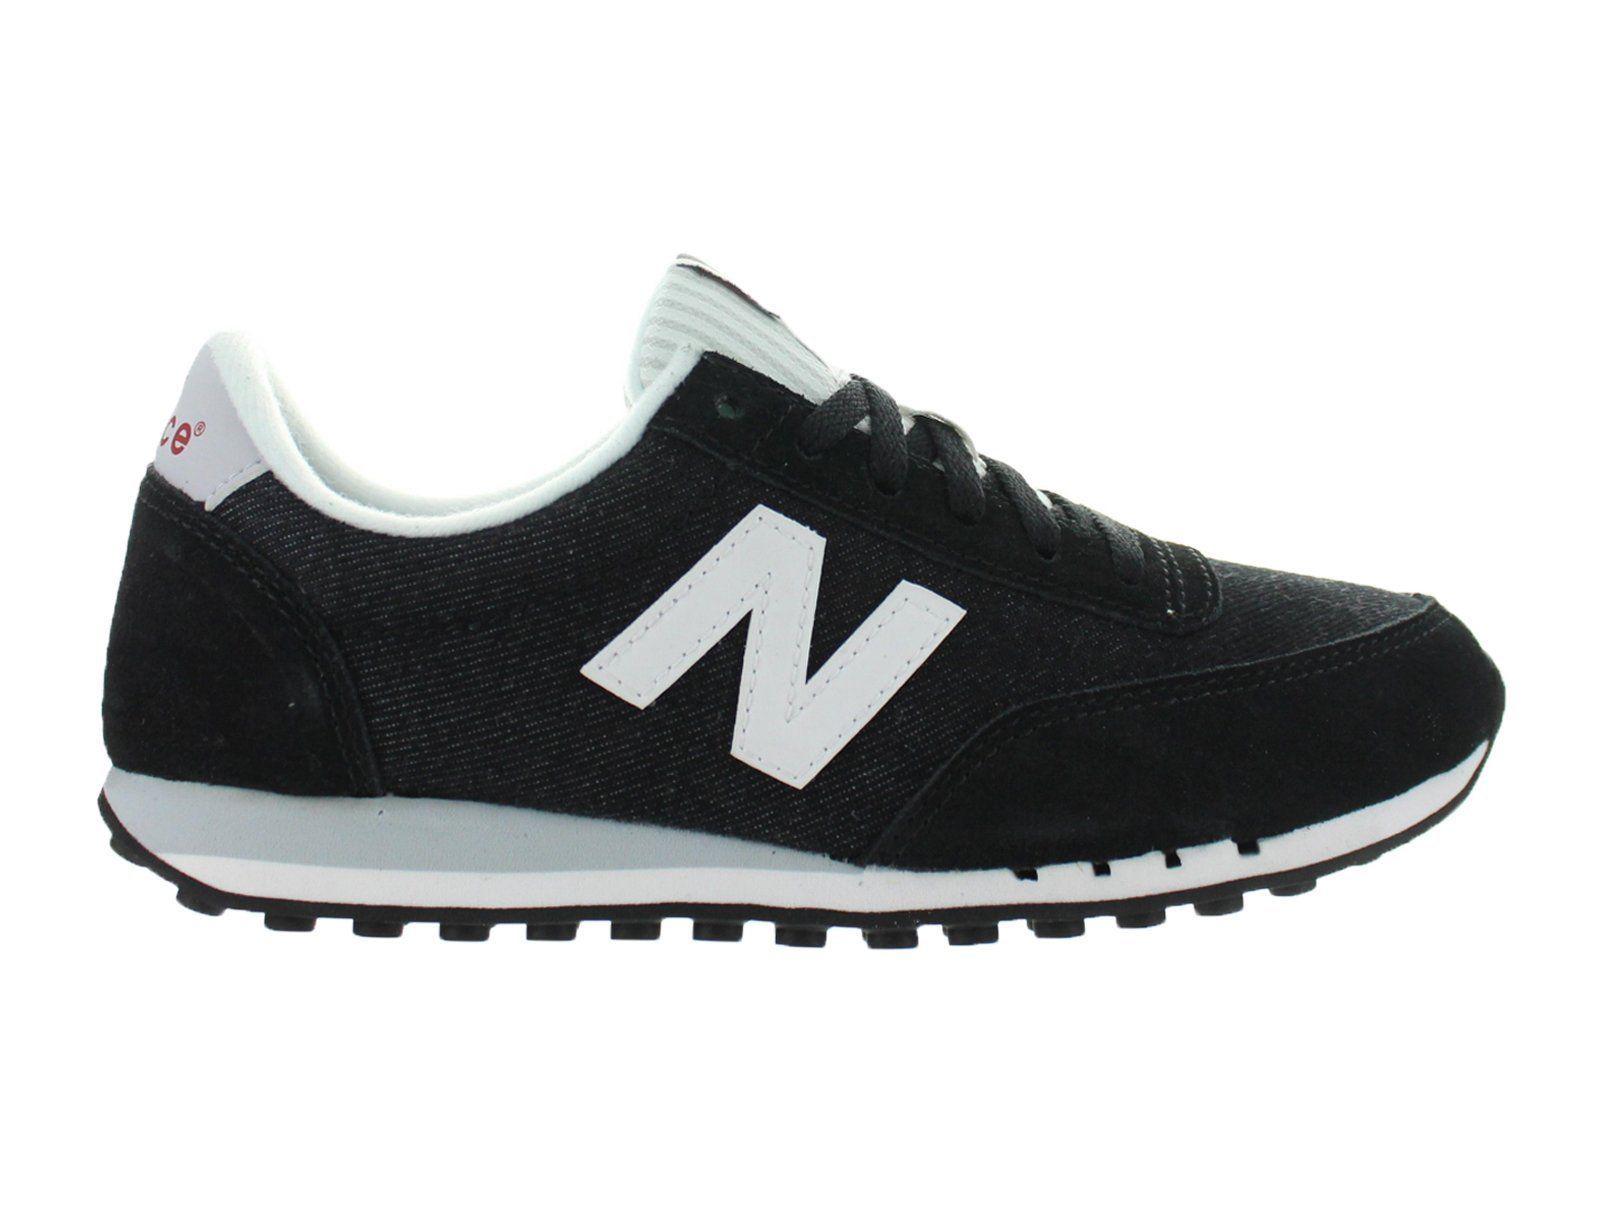 magasin en ligne 2351c 74c8b new balance 450 running shoe review